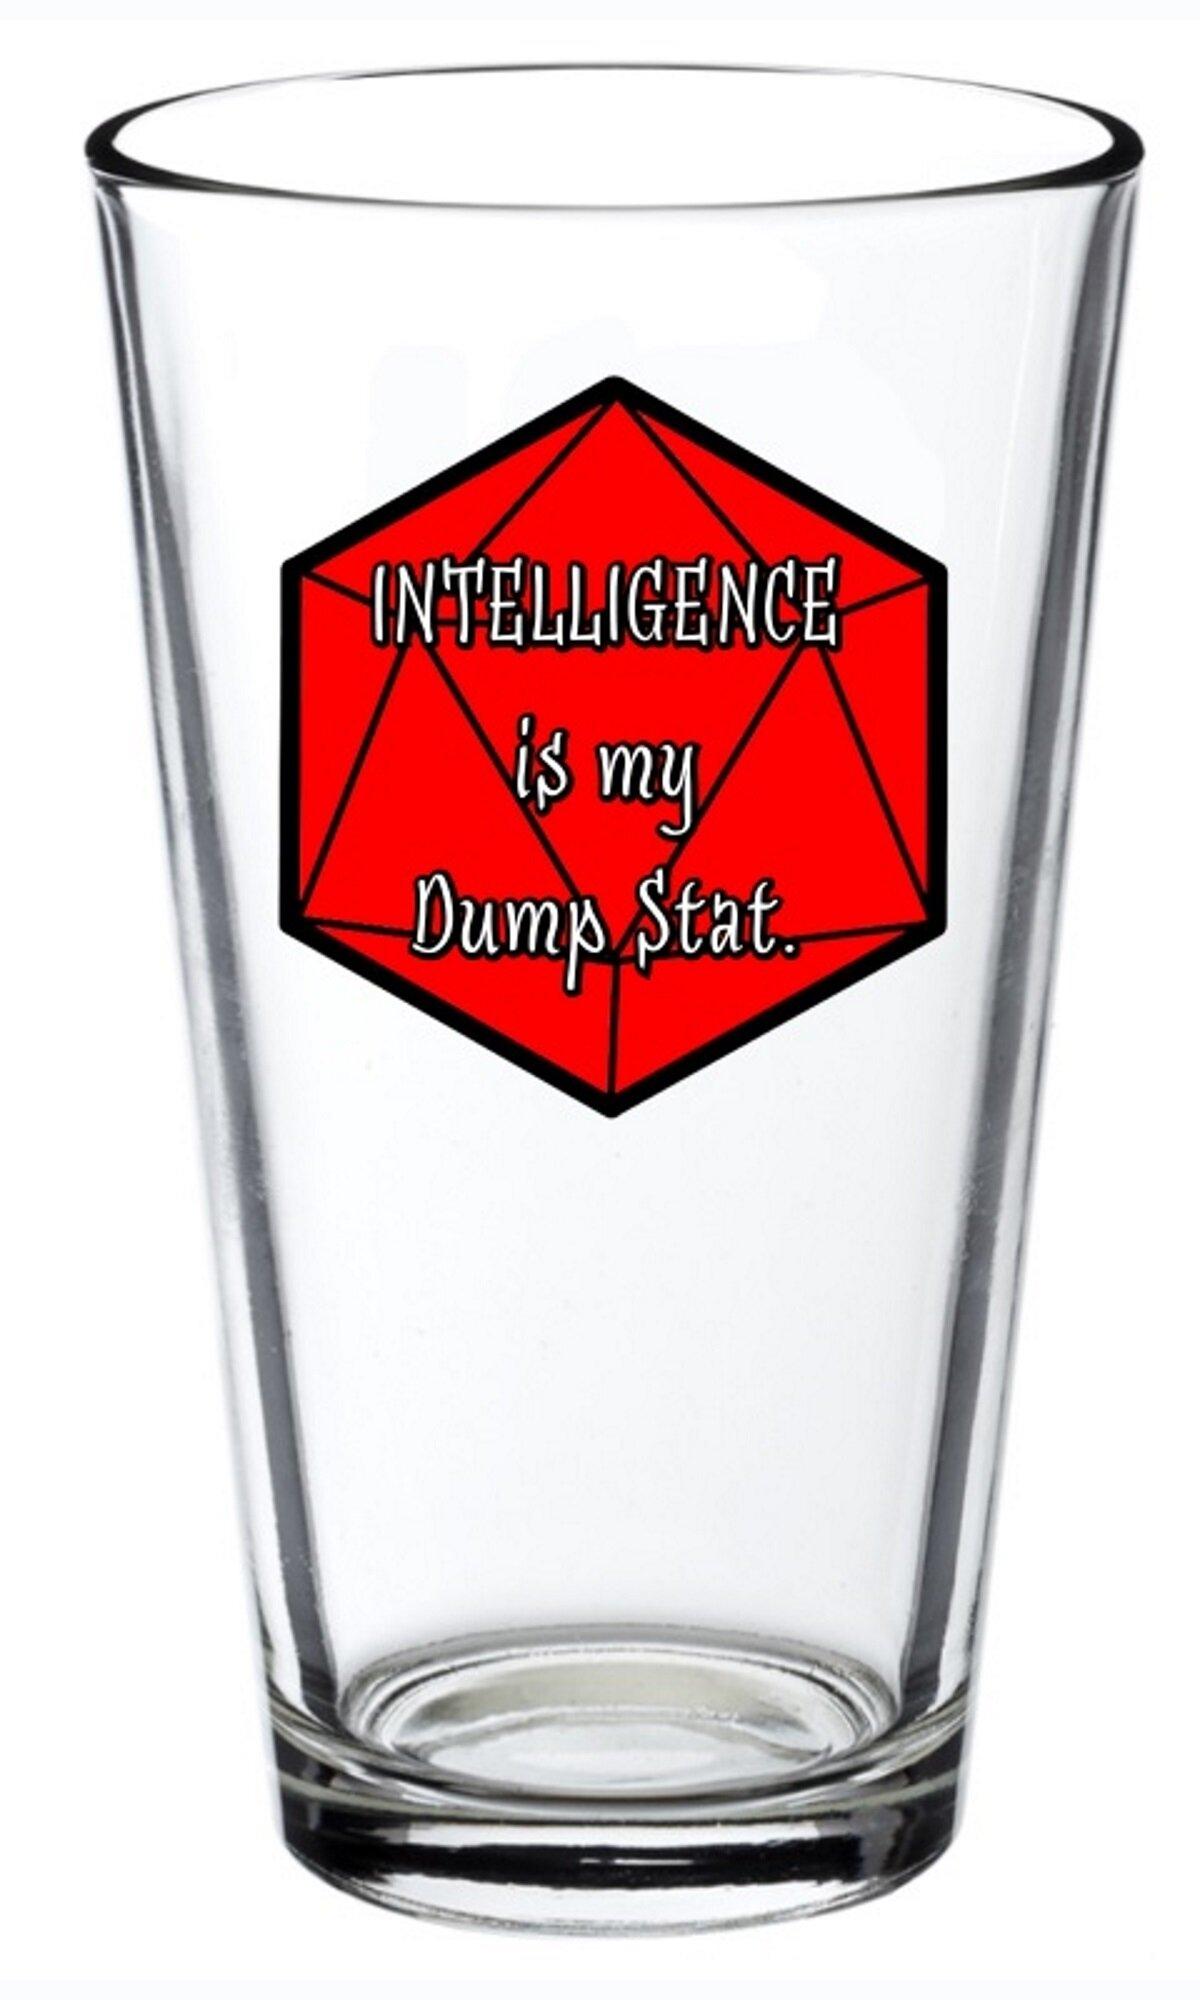 Intelligence is my Dump Stat.